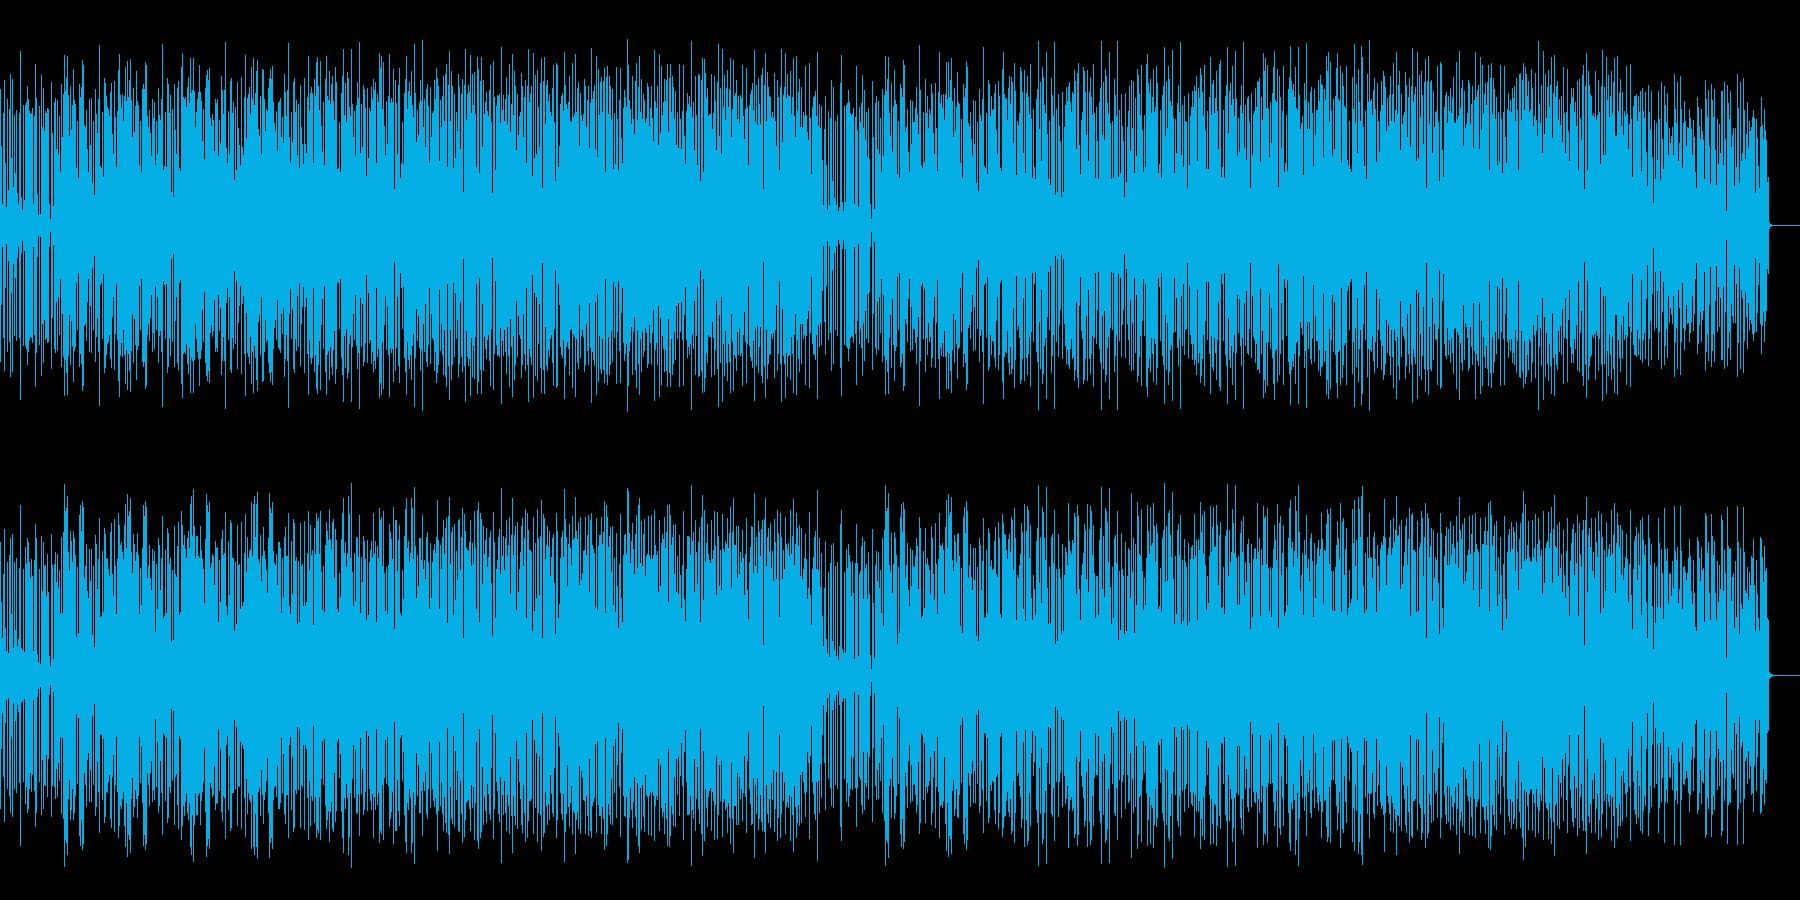 Jazzyでファンキーなヒップホップの再生済みの波形